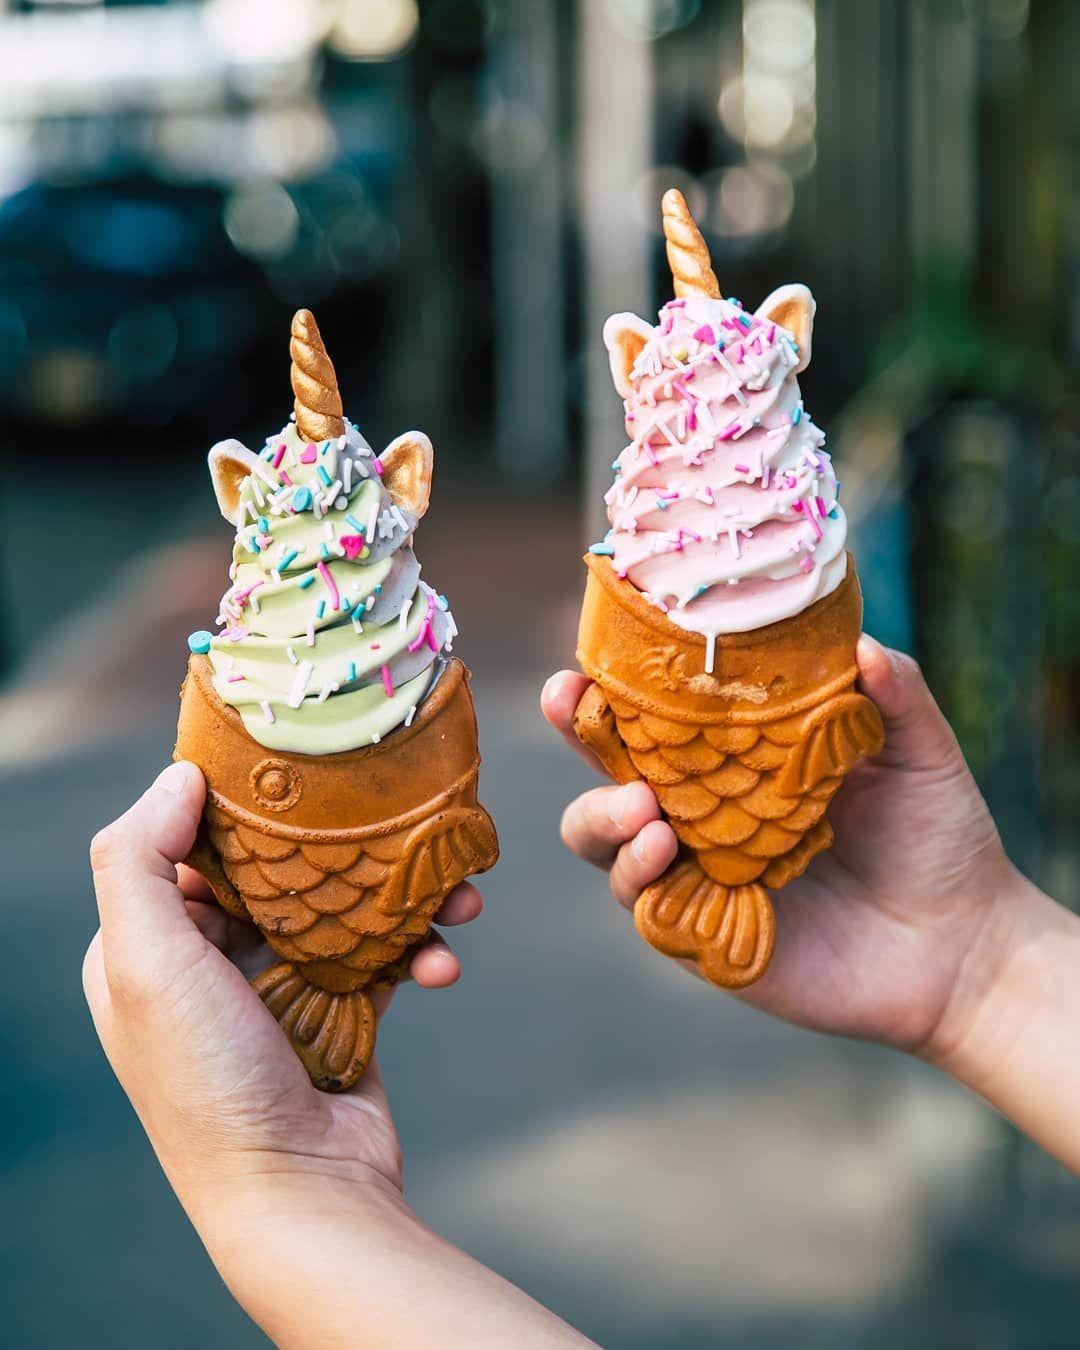 Ice Cream Aesthetic Blackpink